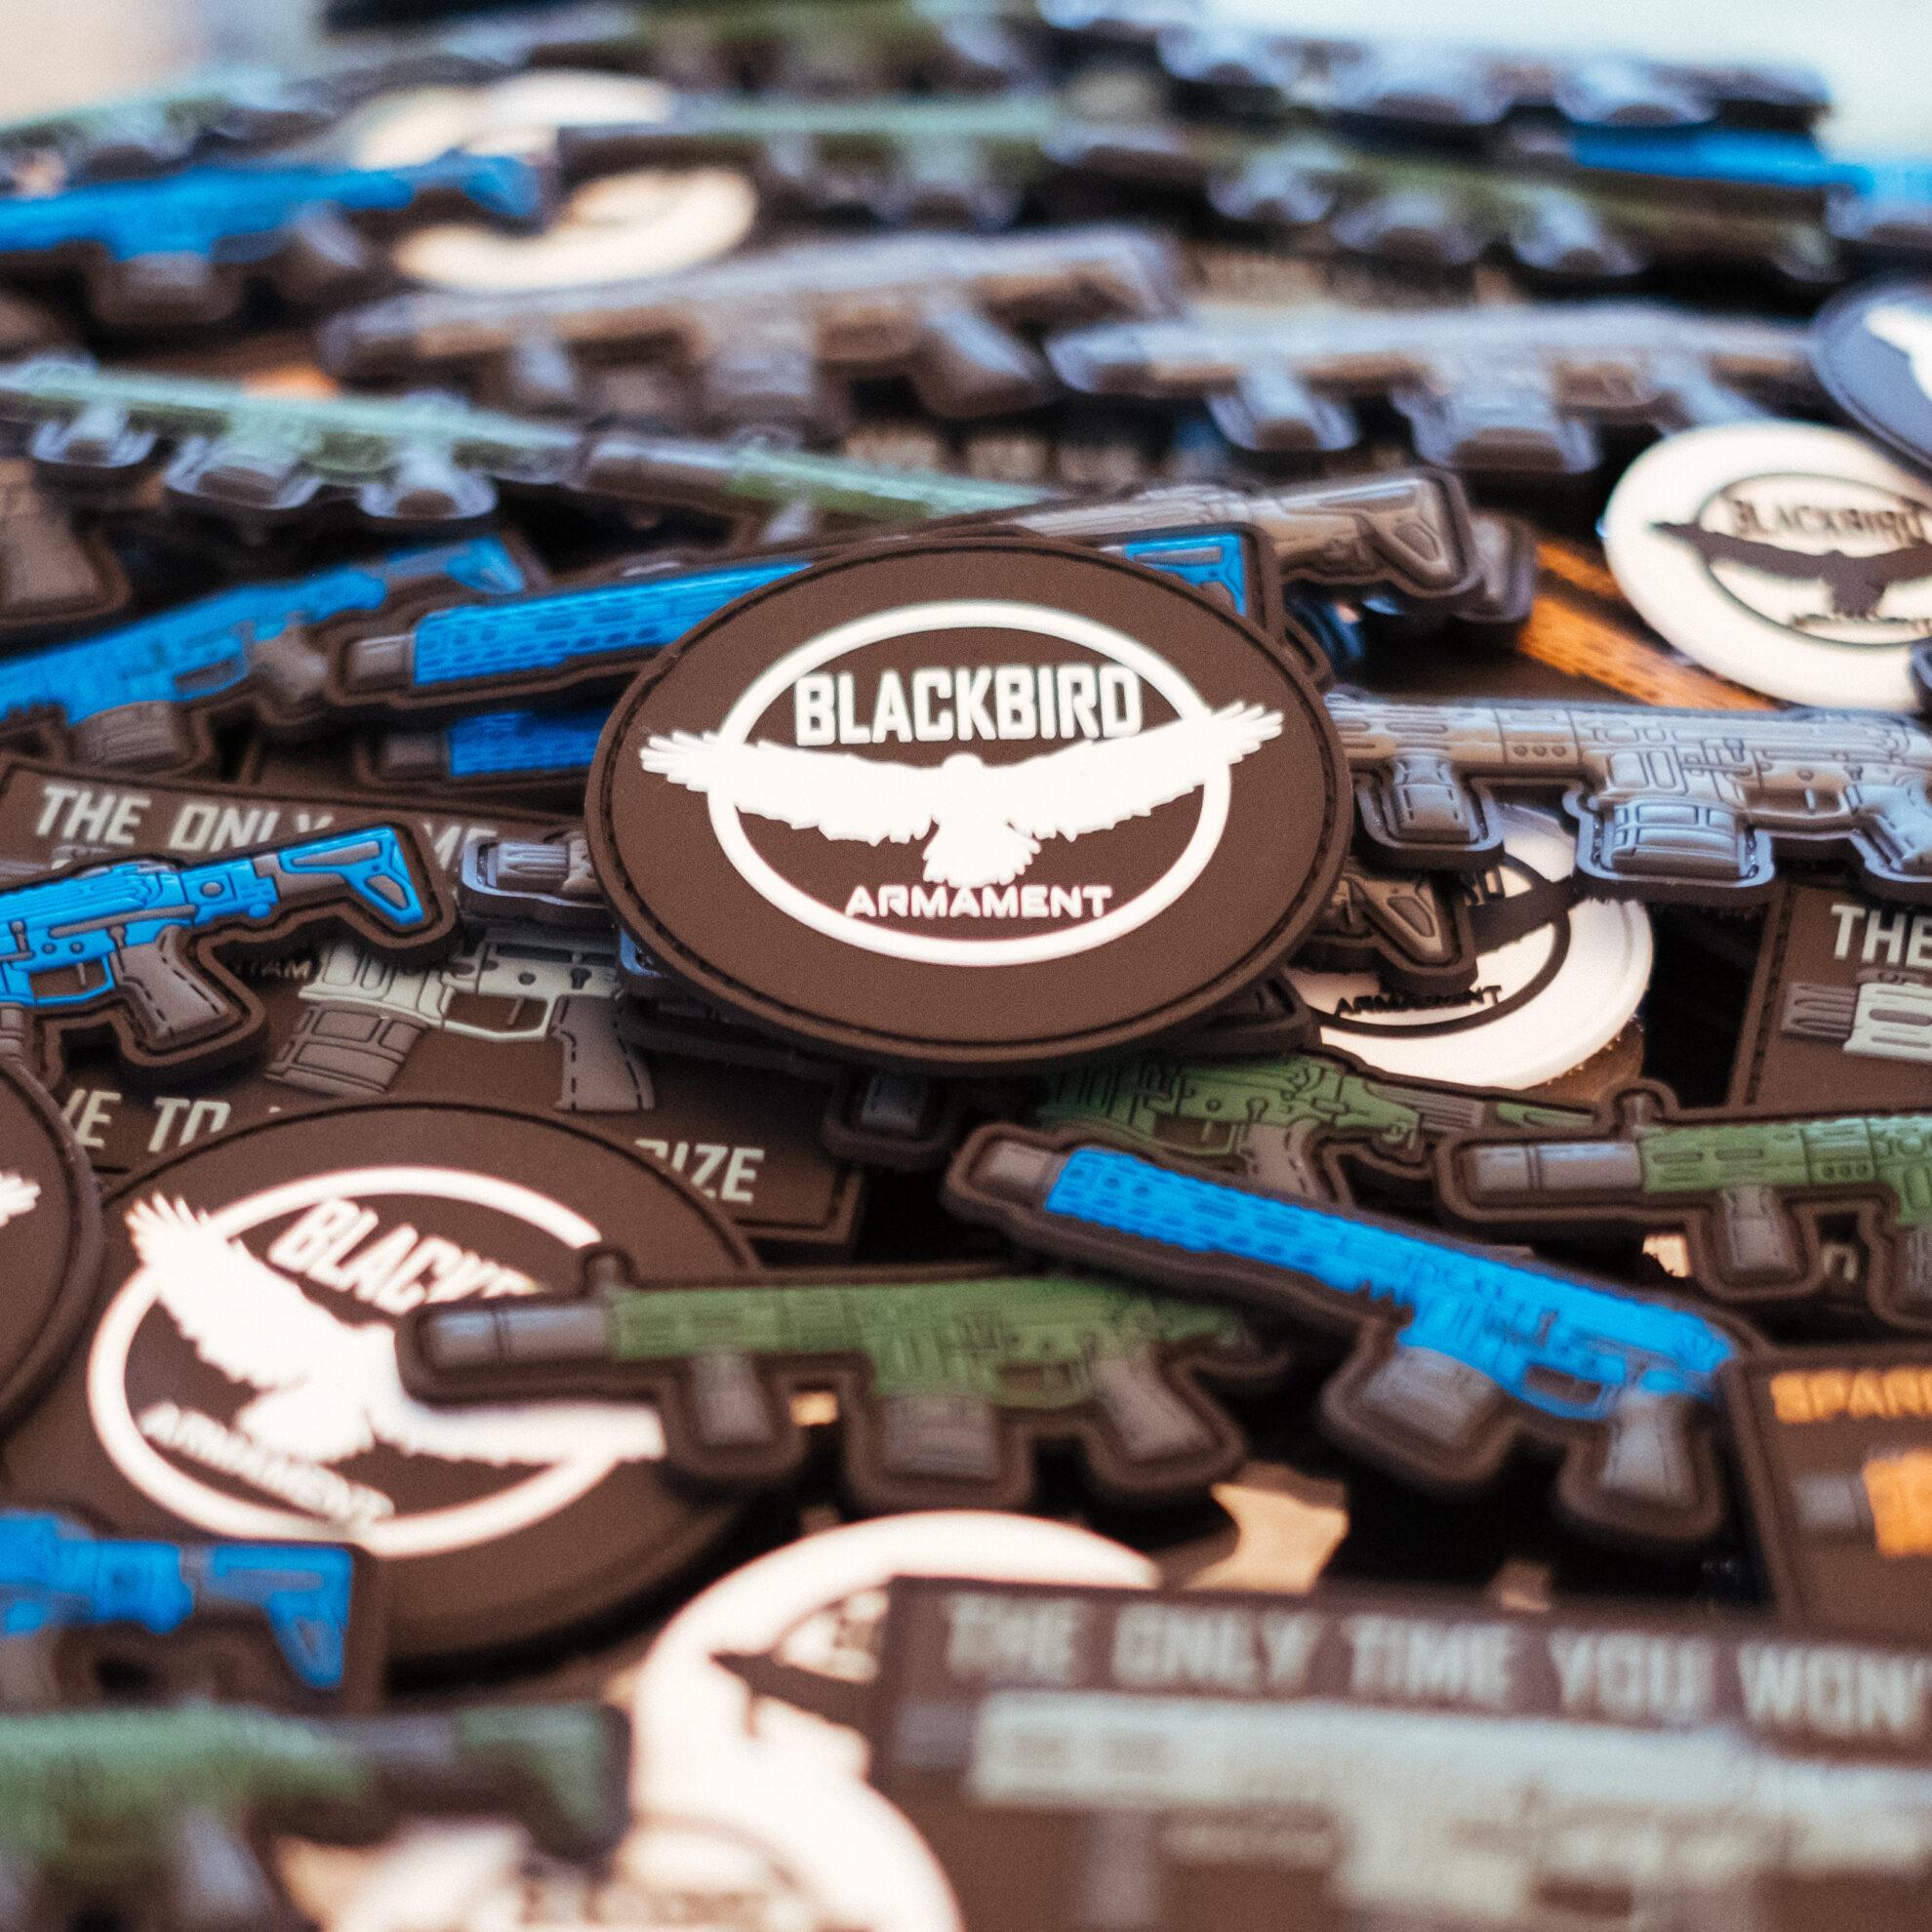 Blackbird patches